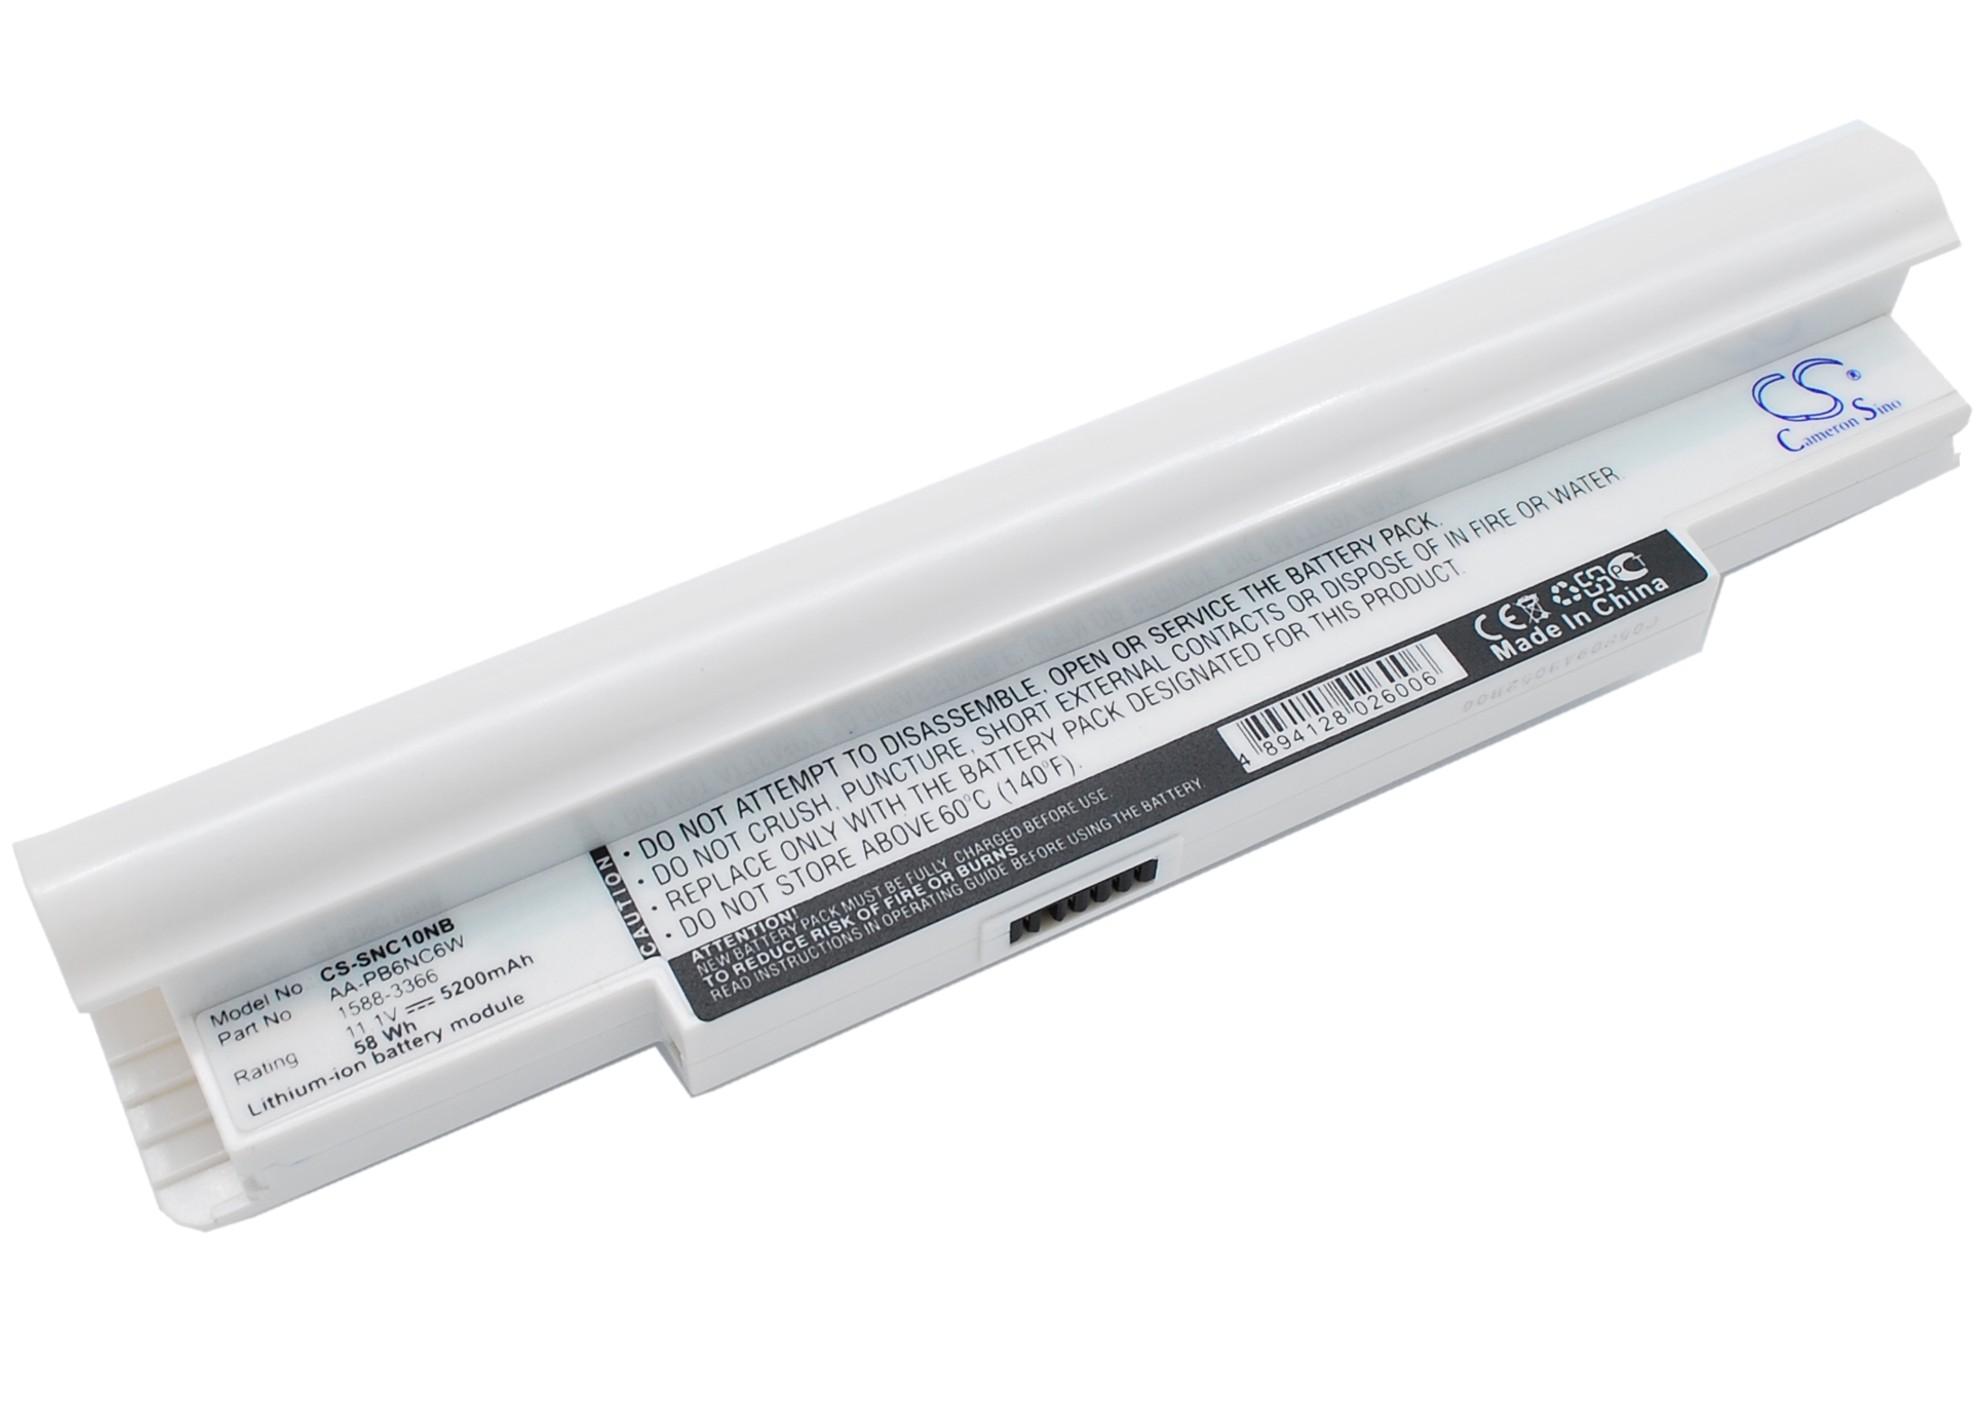 Cameron Sino baterie do notebooků pro SAMSUNG NP-NC20-KA01 11.1V Li-ion 5200mAh bílá - neoriginální